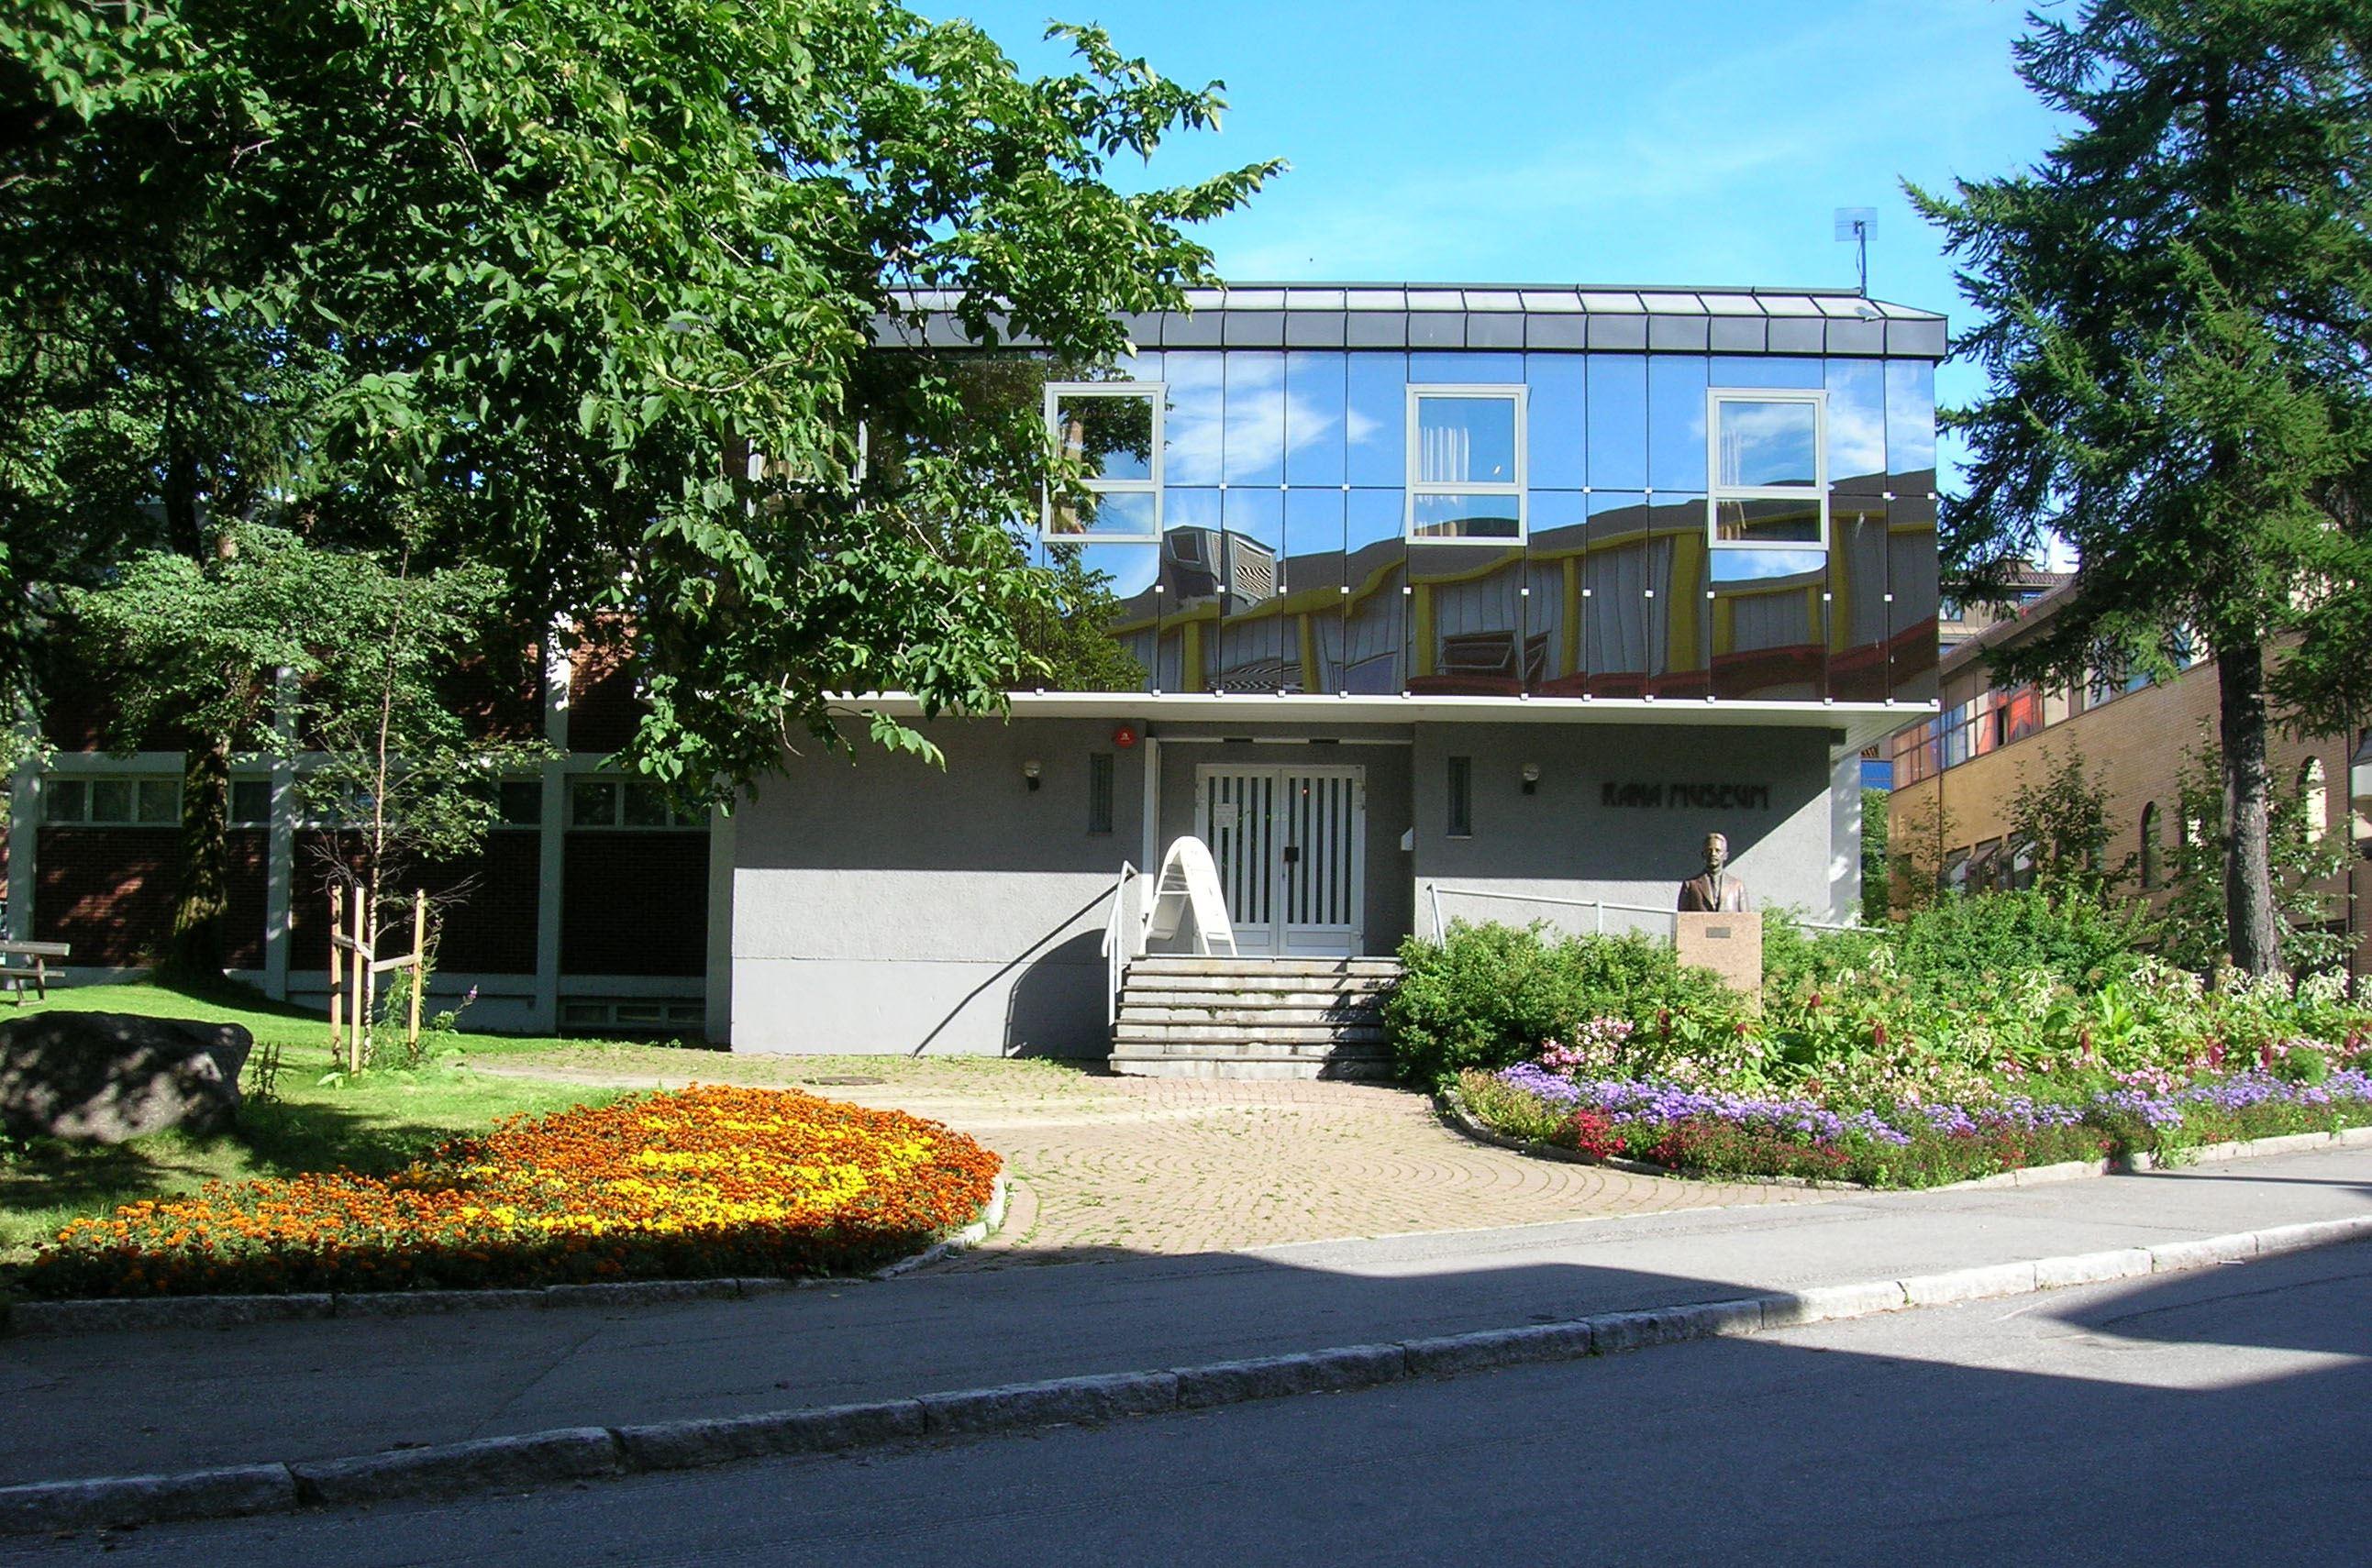 Rana Museum,  © Rana museum, Helgeland Museum abt. Rana